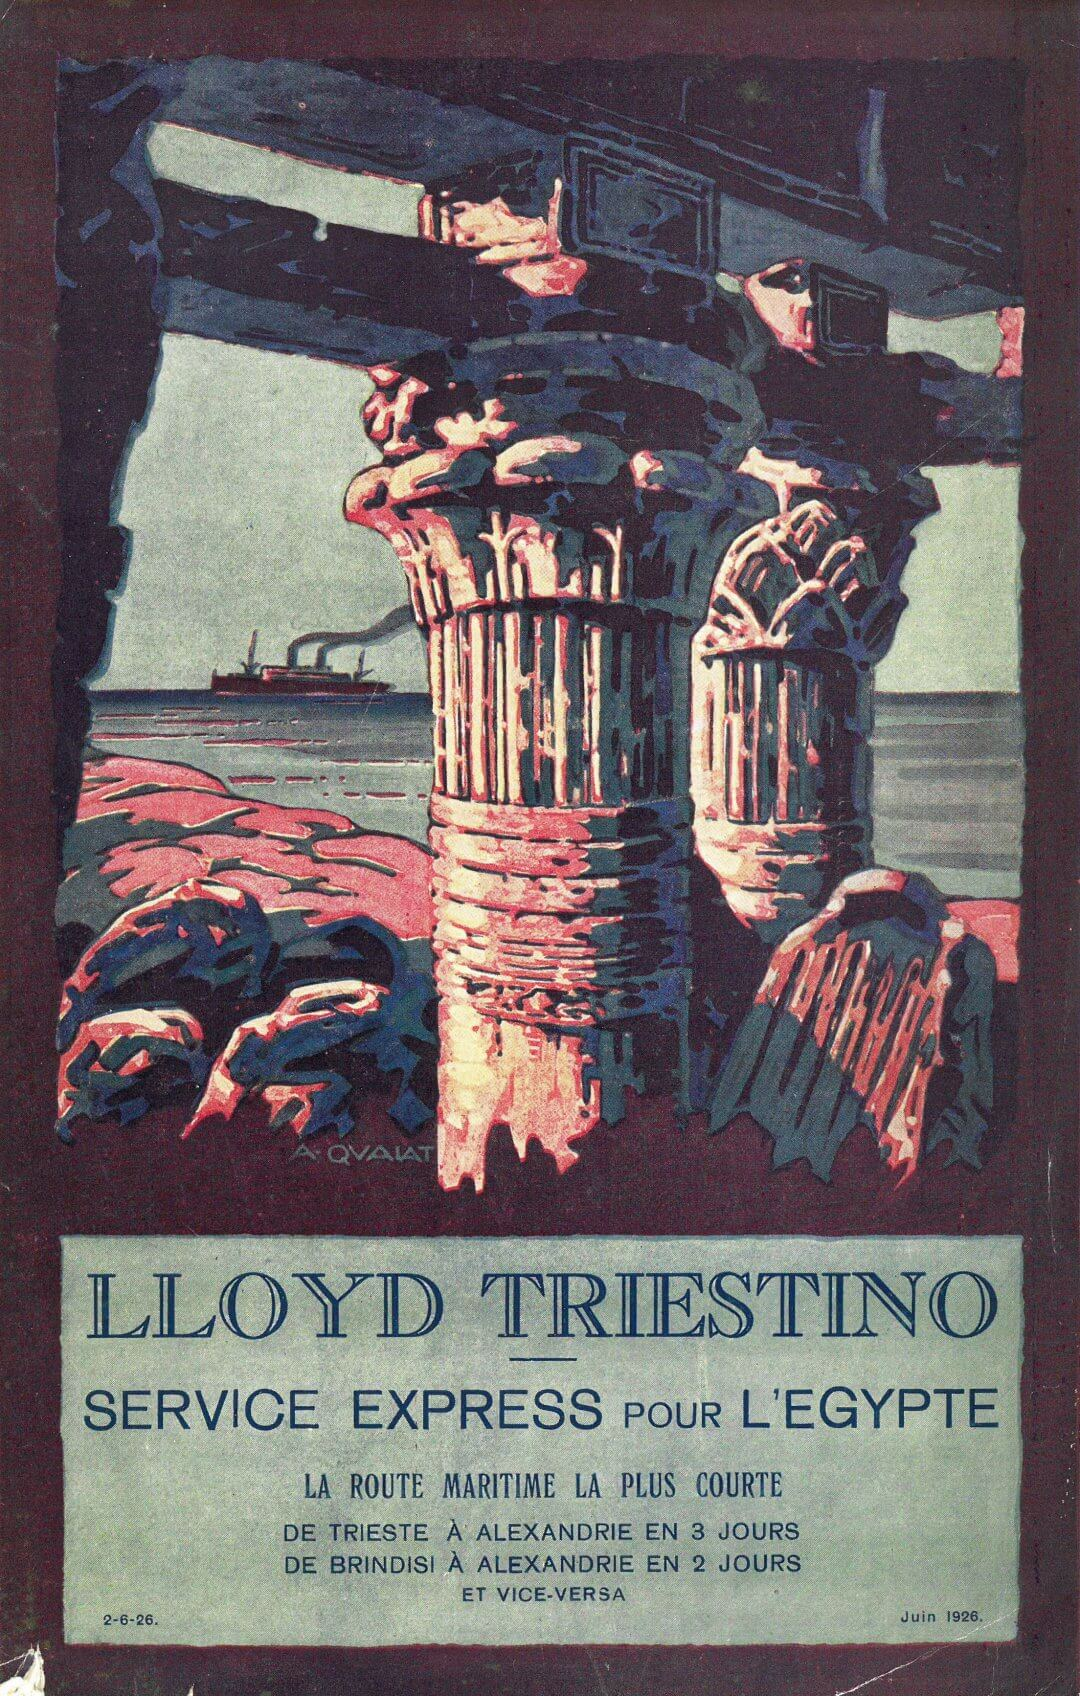 Lloyd Triestino Express to Egypt